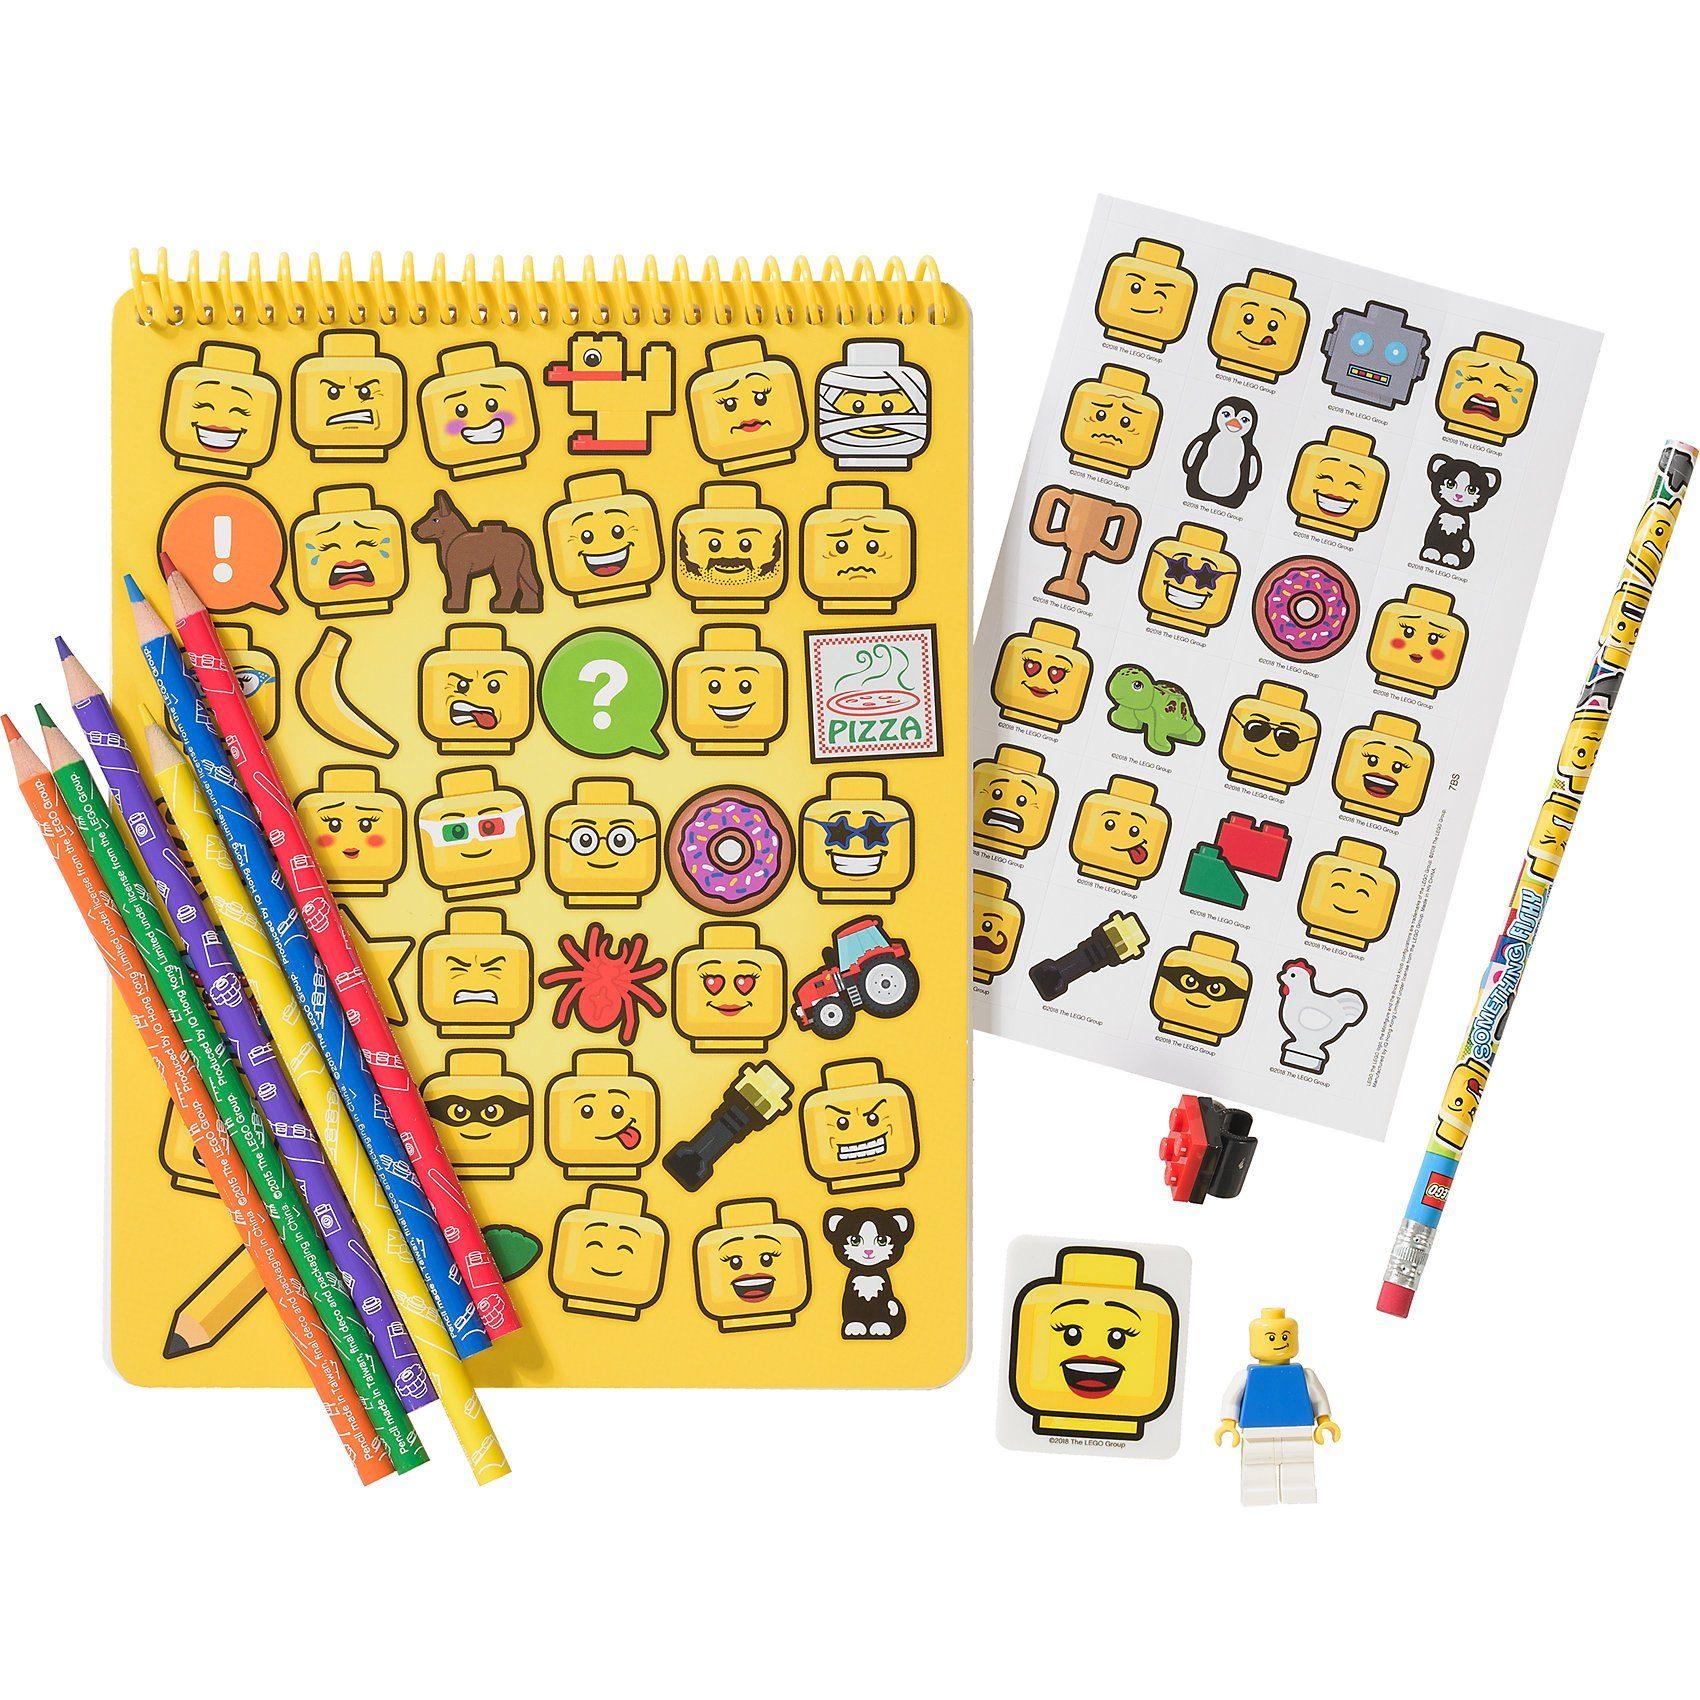 LEGO ® Iconic Schreibwarenset, 12-tlg.